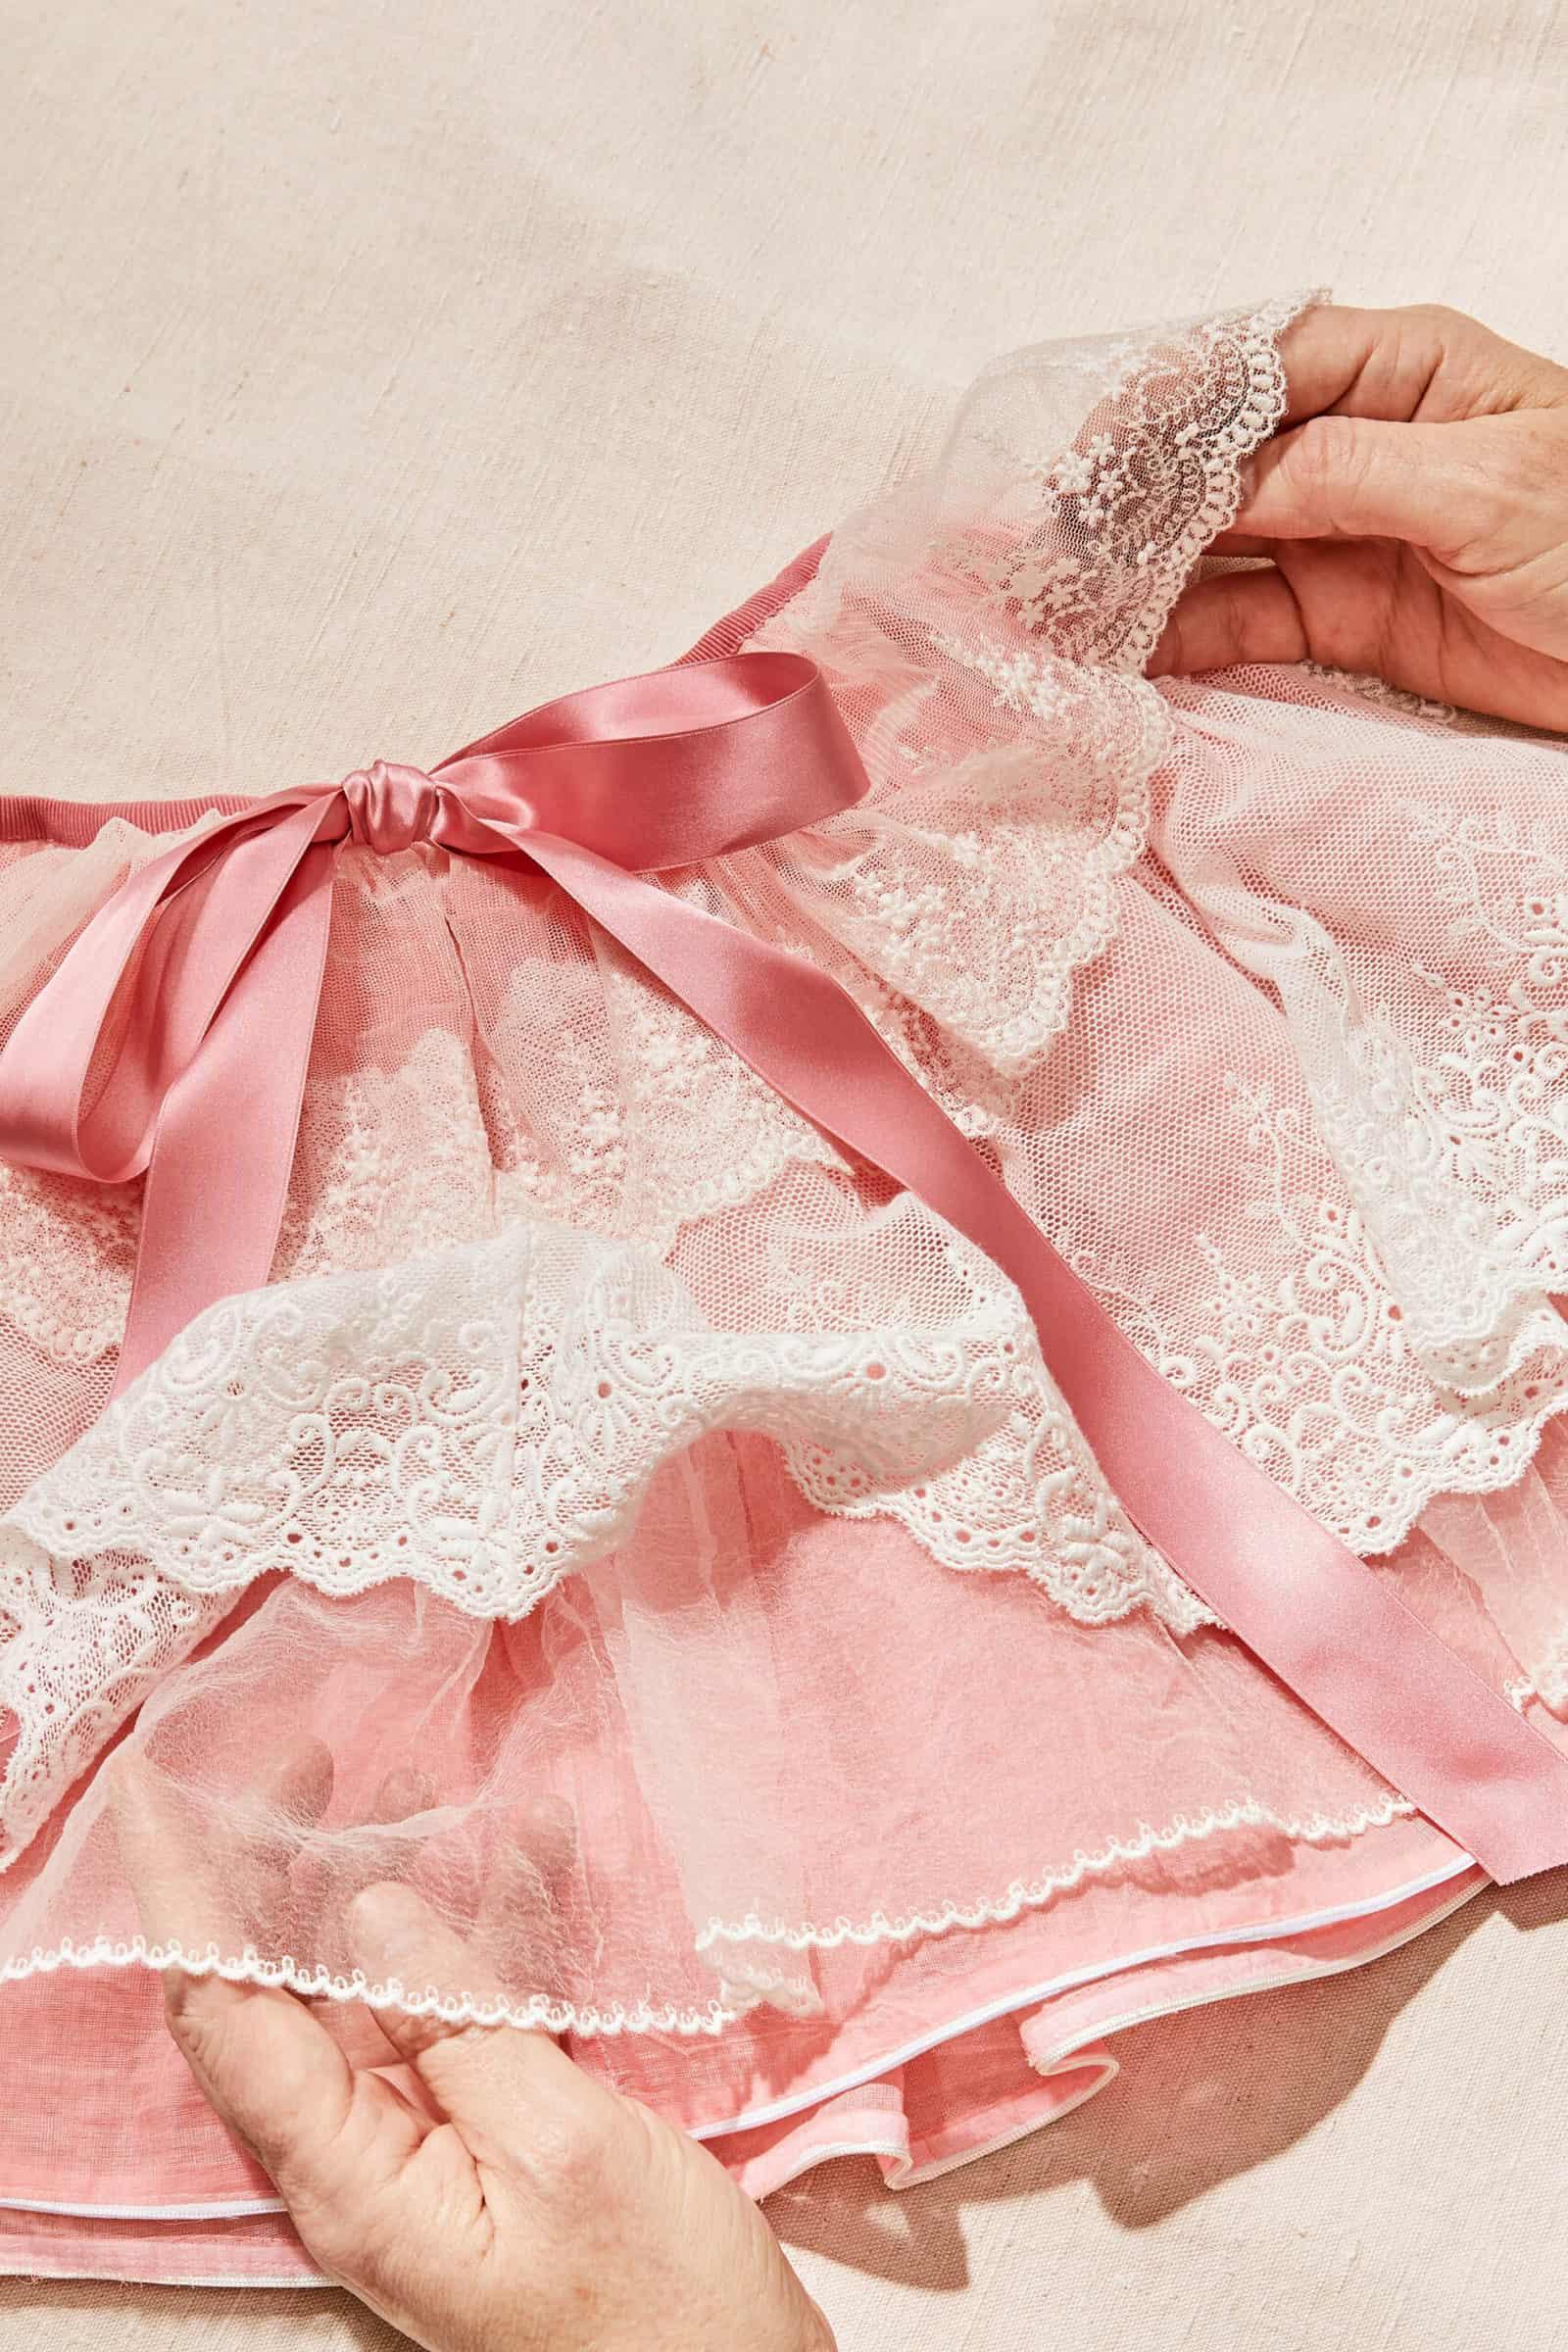 Strawberries & Cream is a luxury British baby and girlswear brand